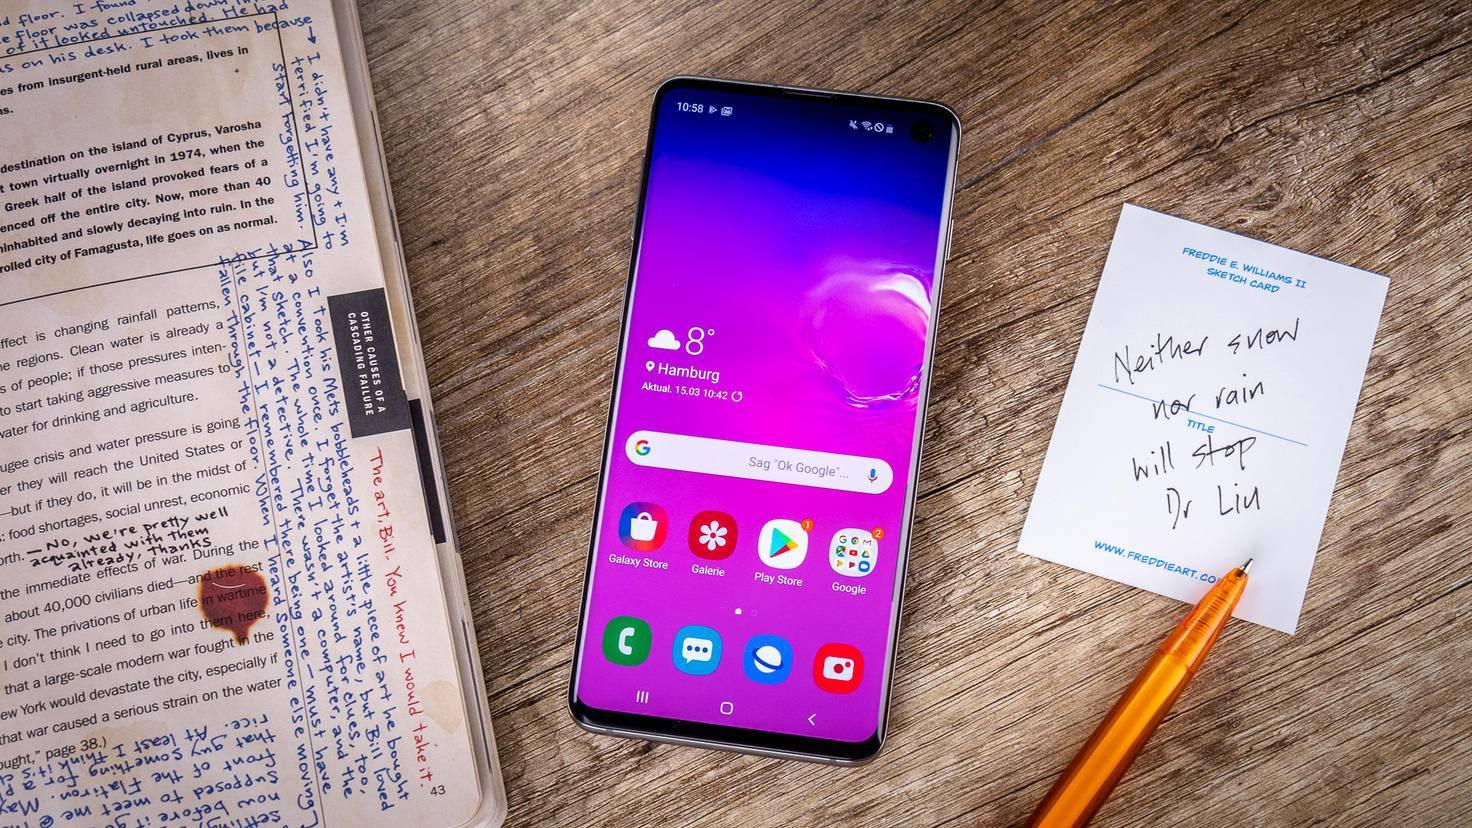 Samsung-Galaxy-S10-Teaserbild